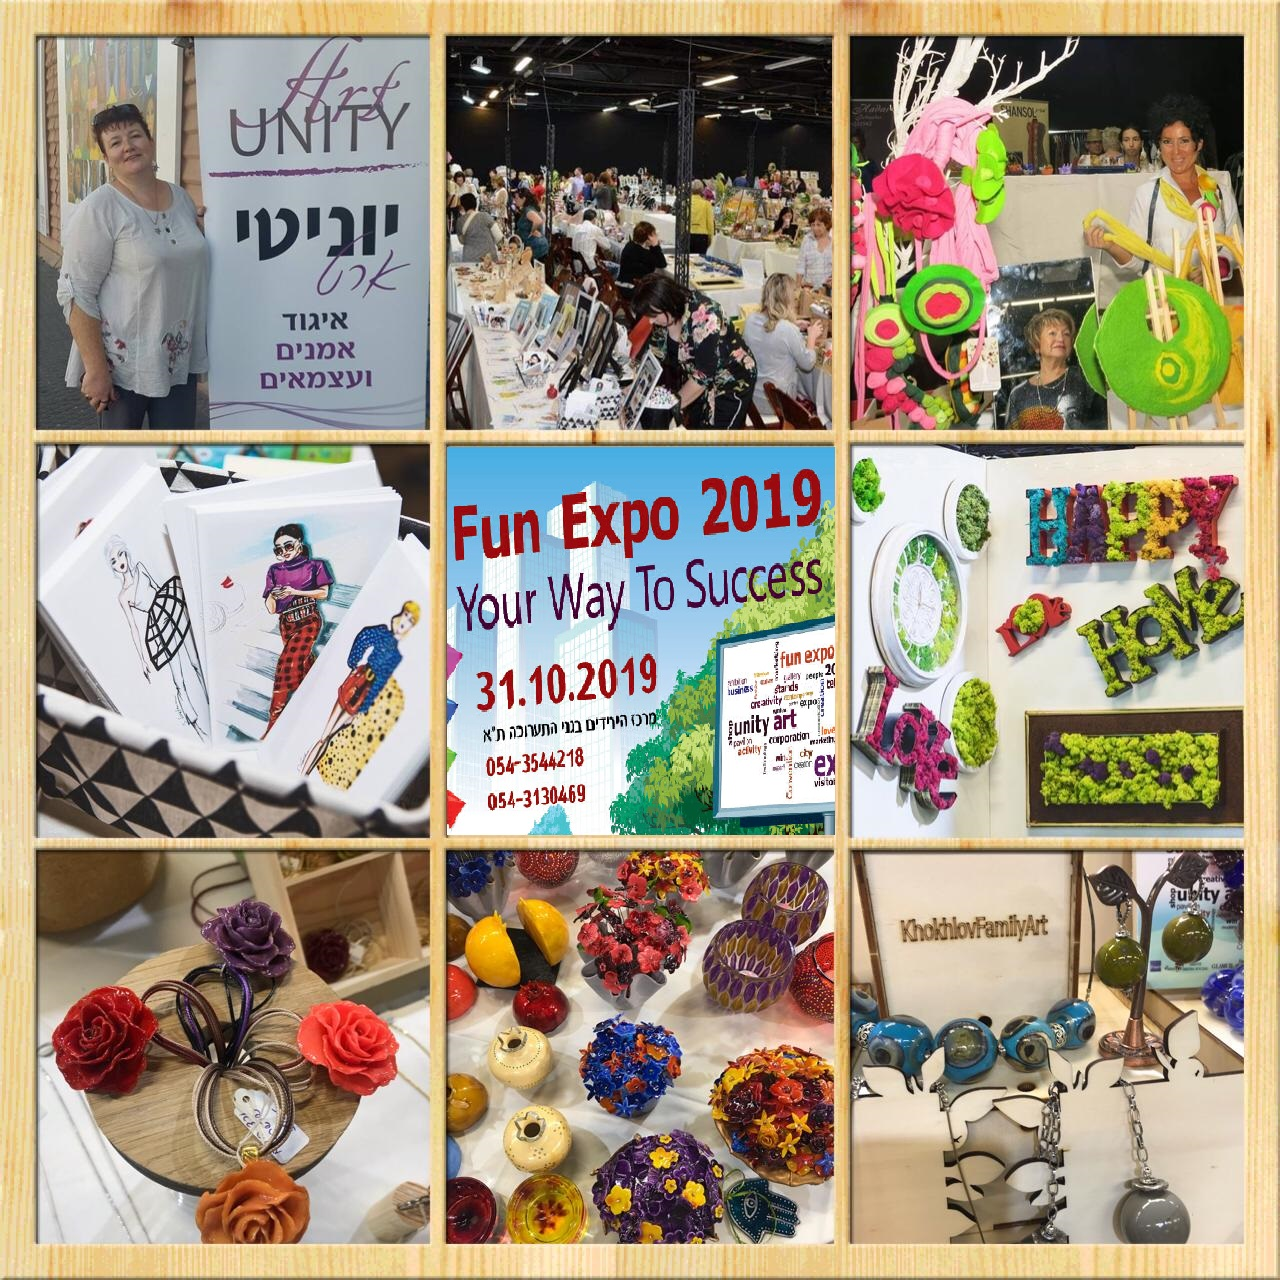 FUN EXPO 2019 Праздник талантливых людей в Ганей Тааруха